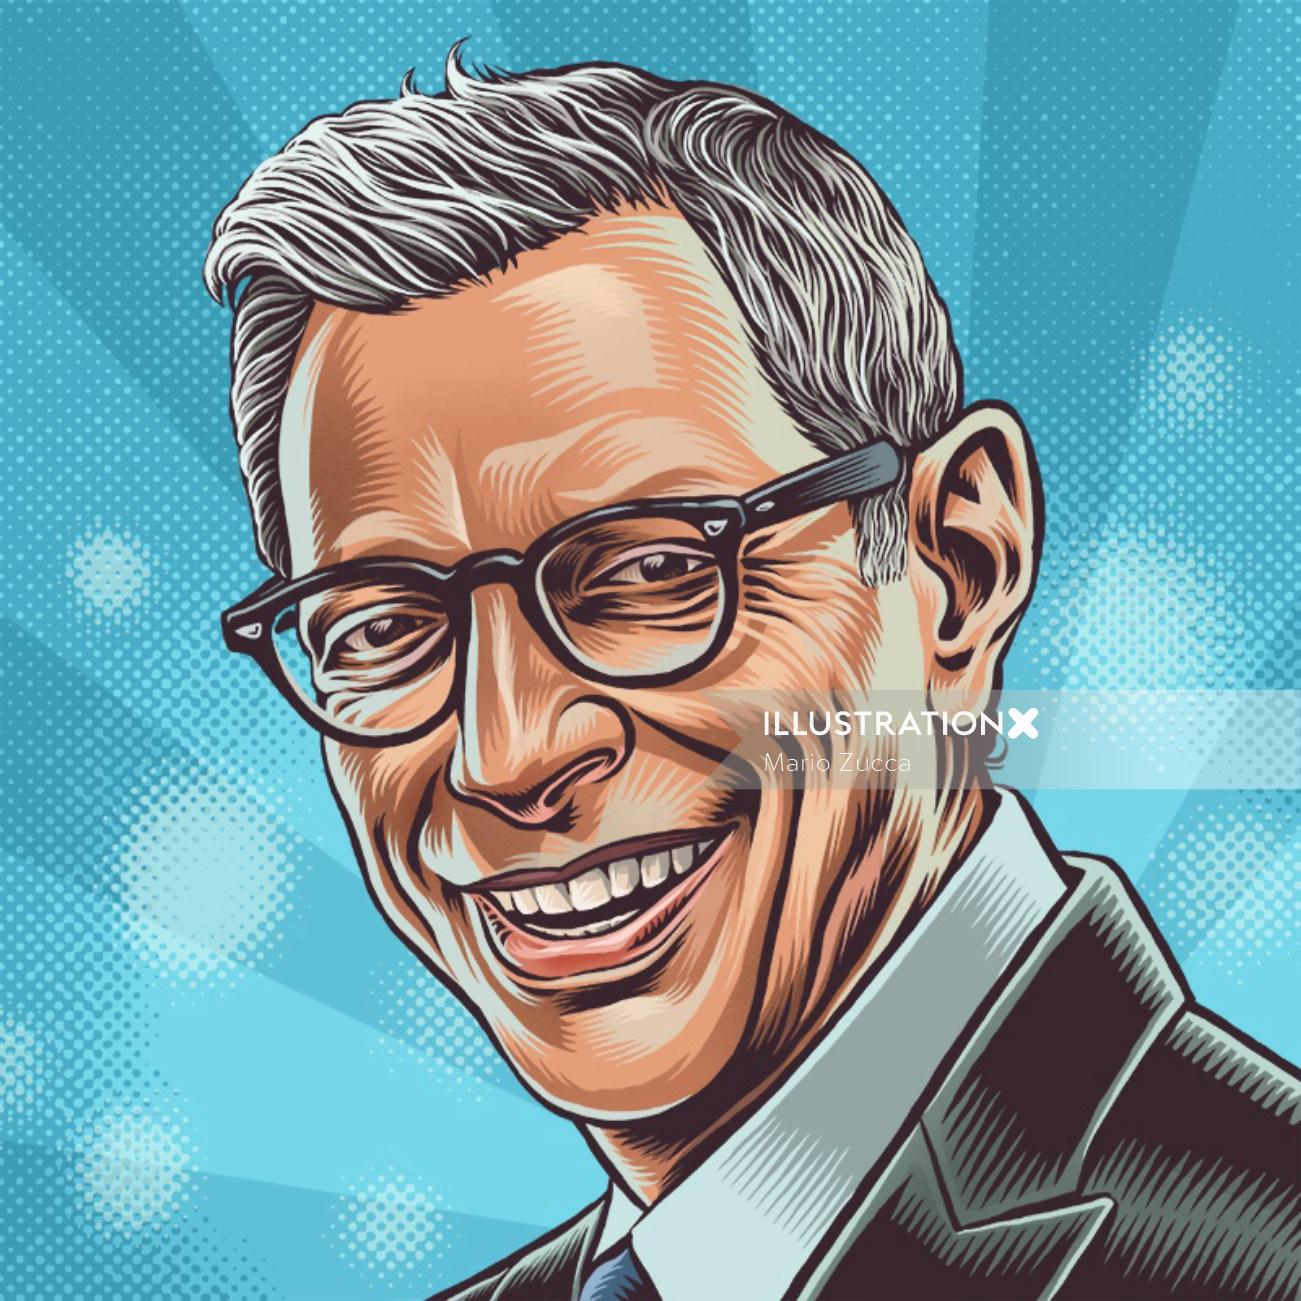 Jeff Goldblum portrait illustration